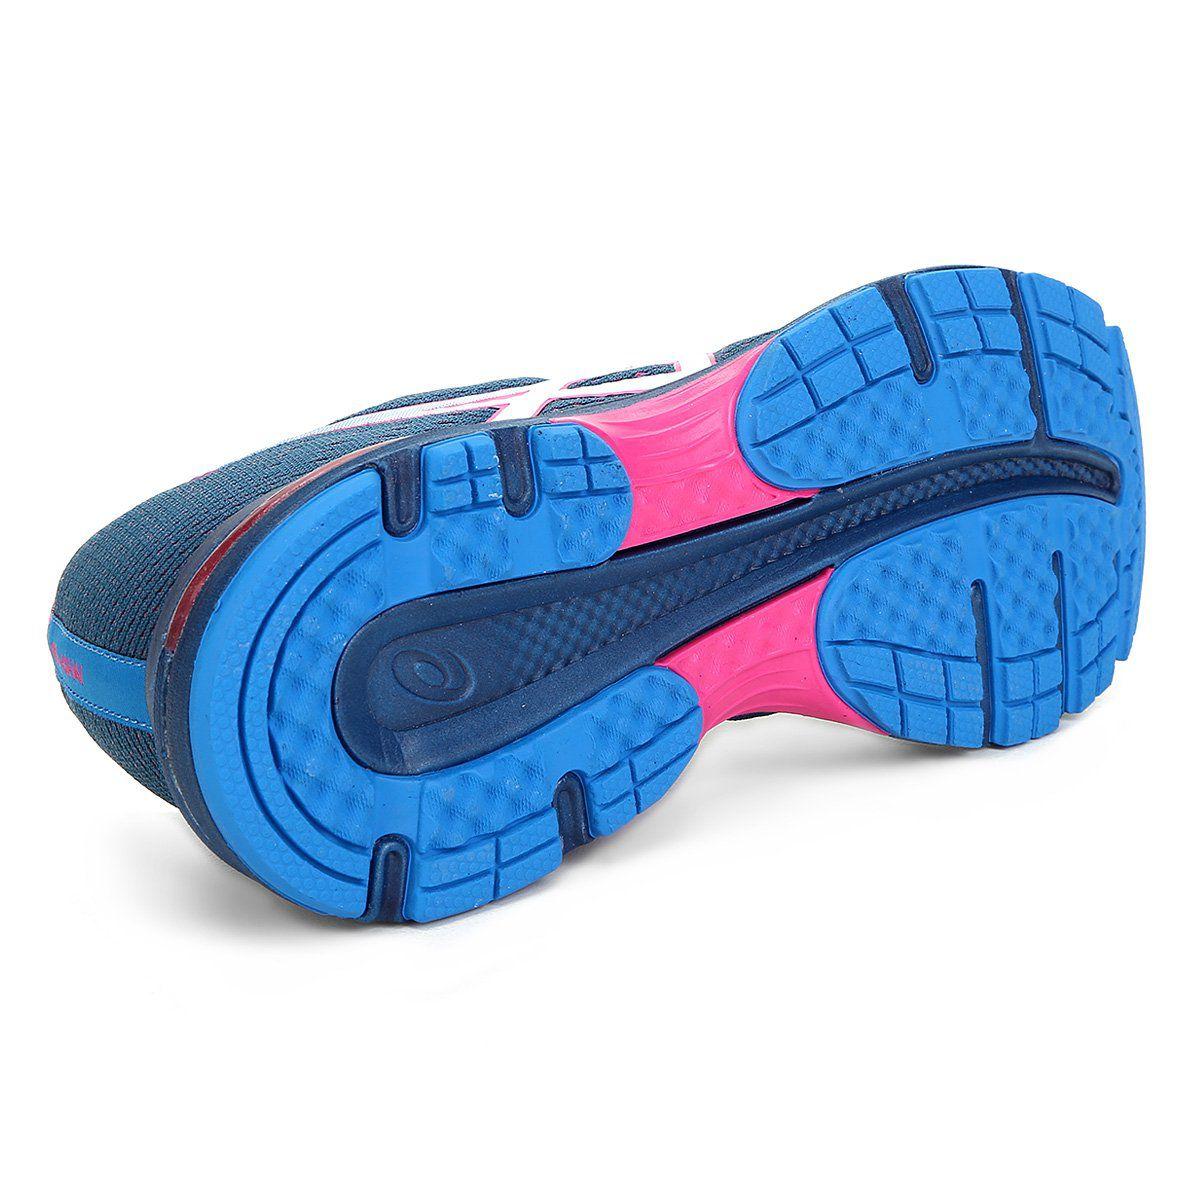 Tenis Asics Gel-Kihai W 1Z12A009-401 Azul  - Dozze Shoes